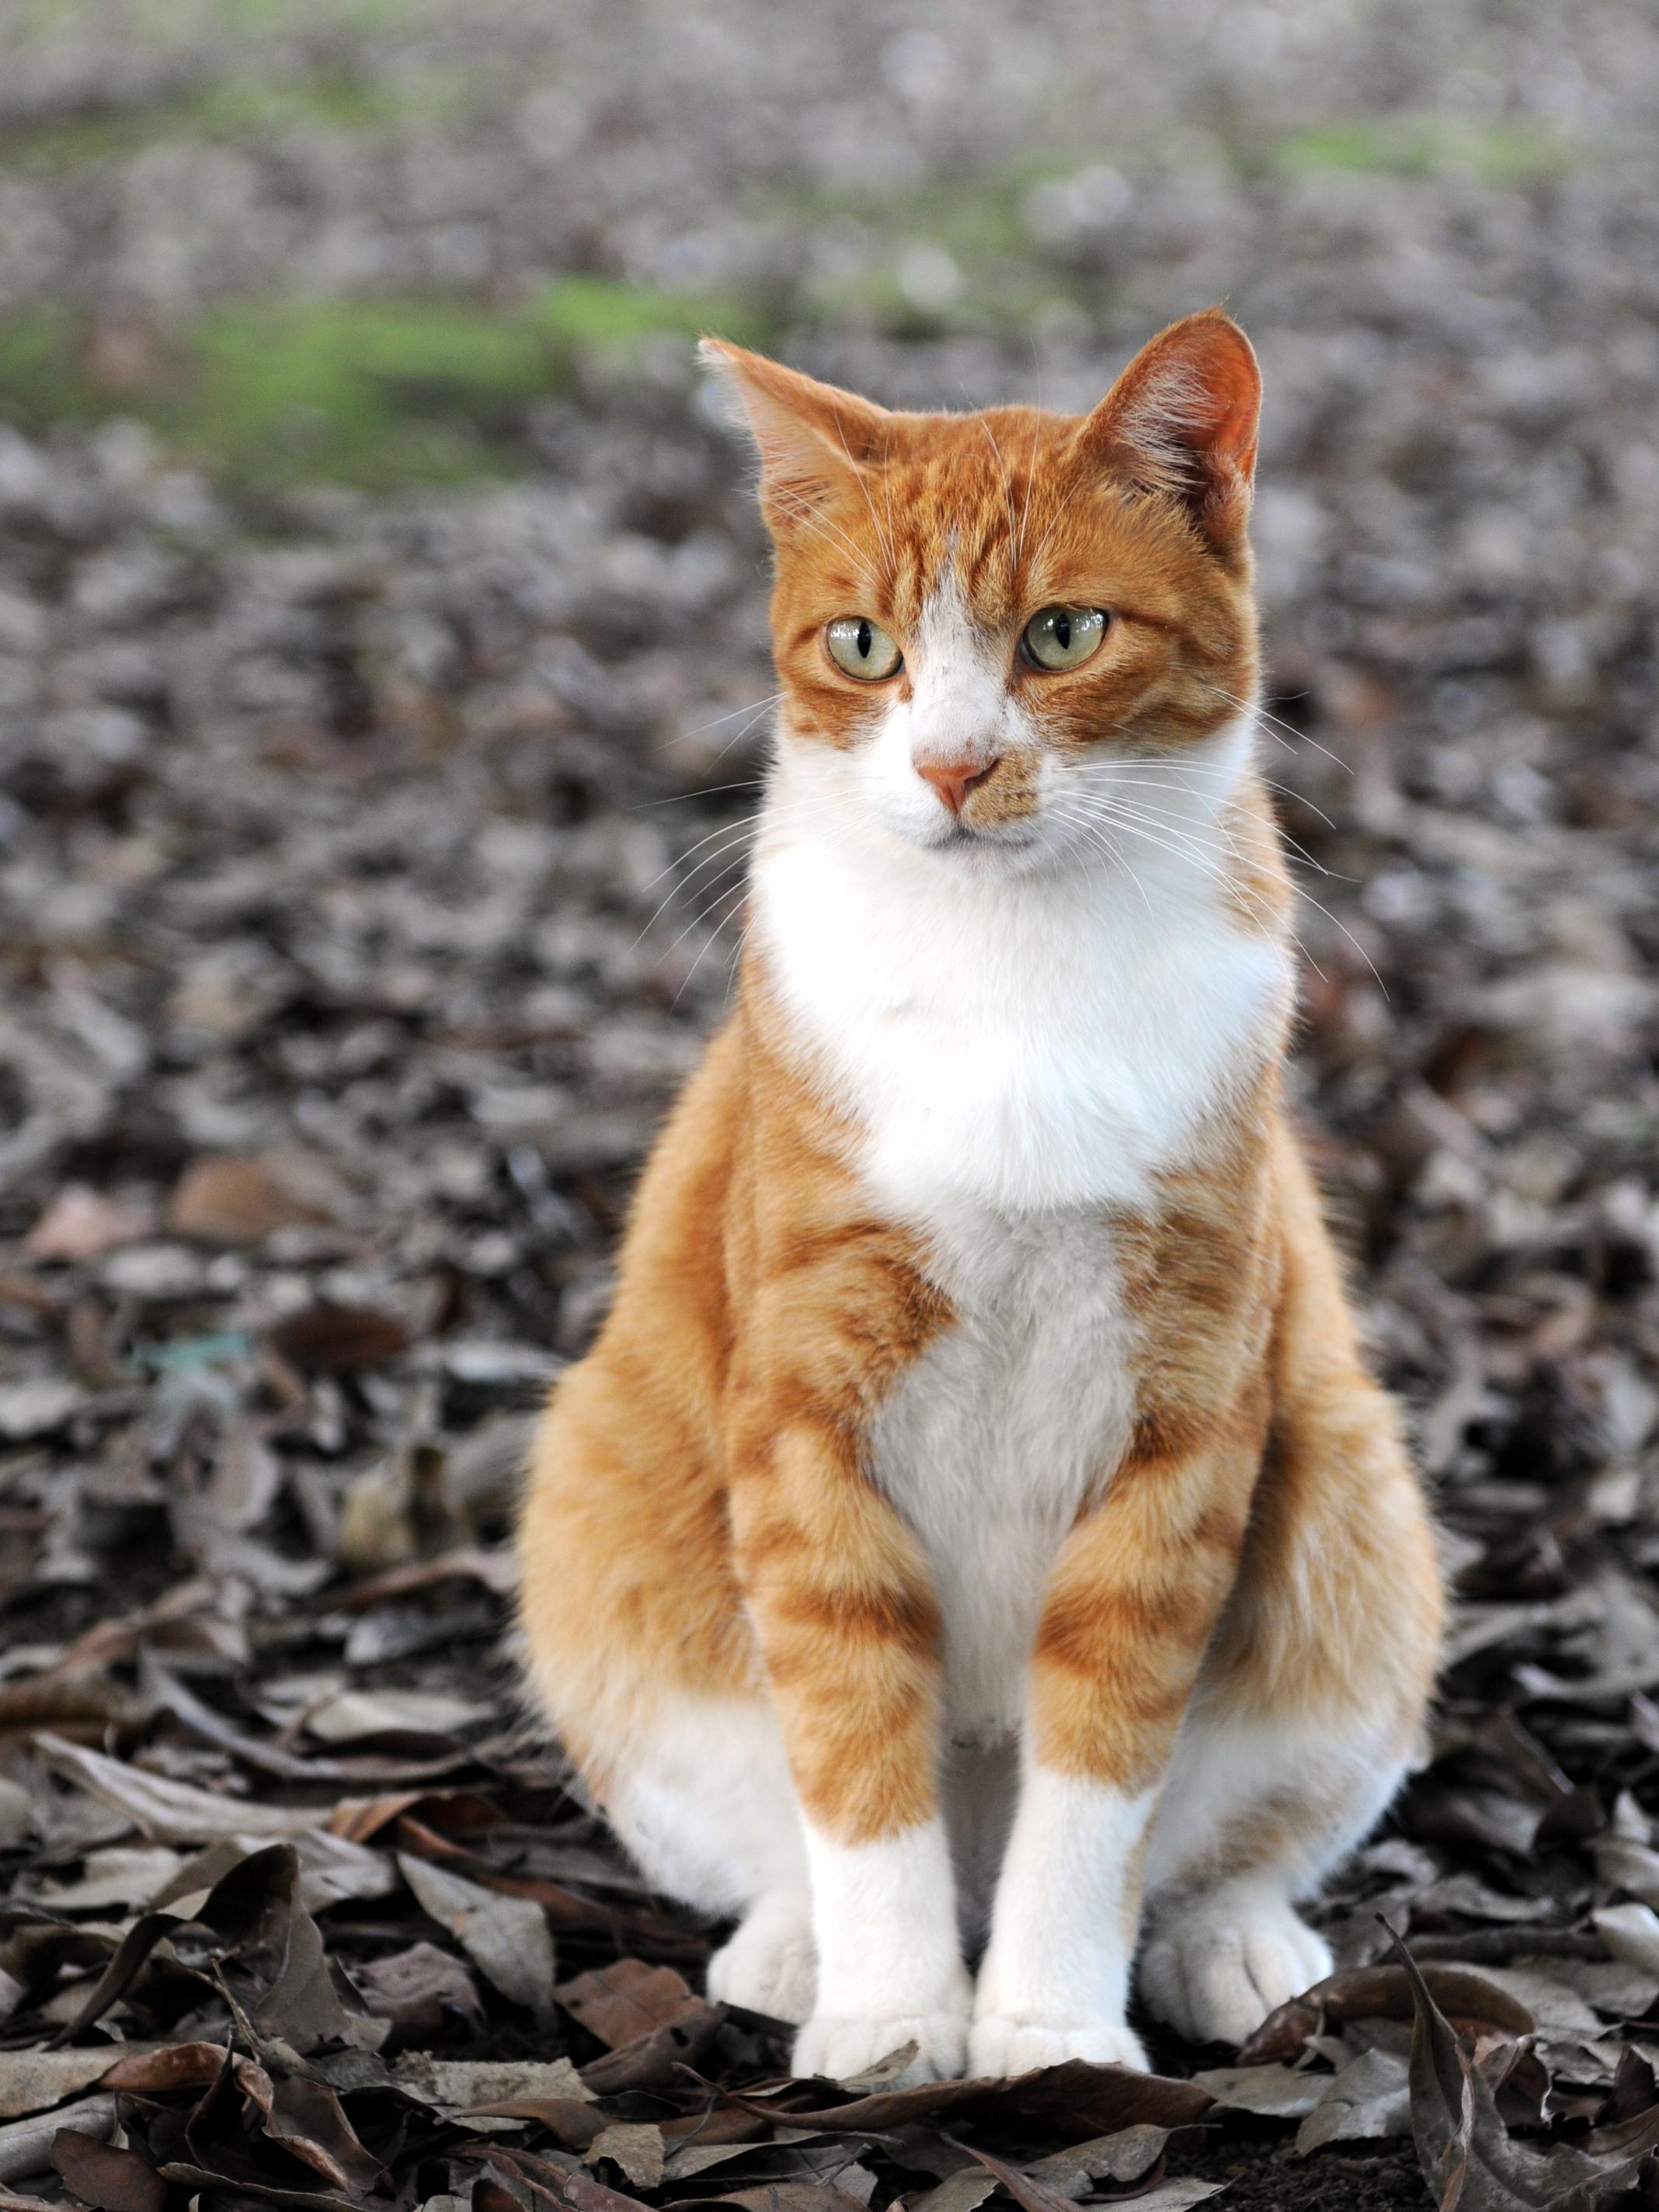 Orange Tabby Cats Sitting